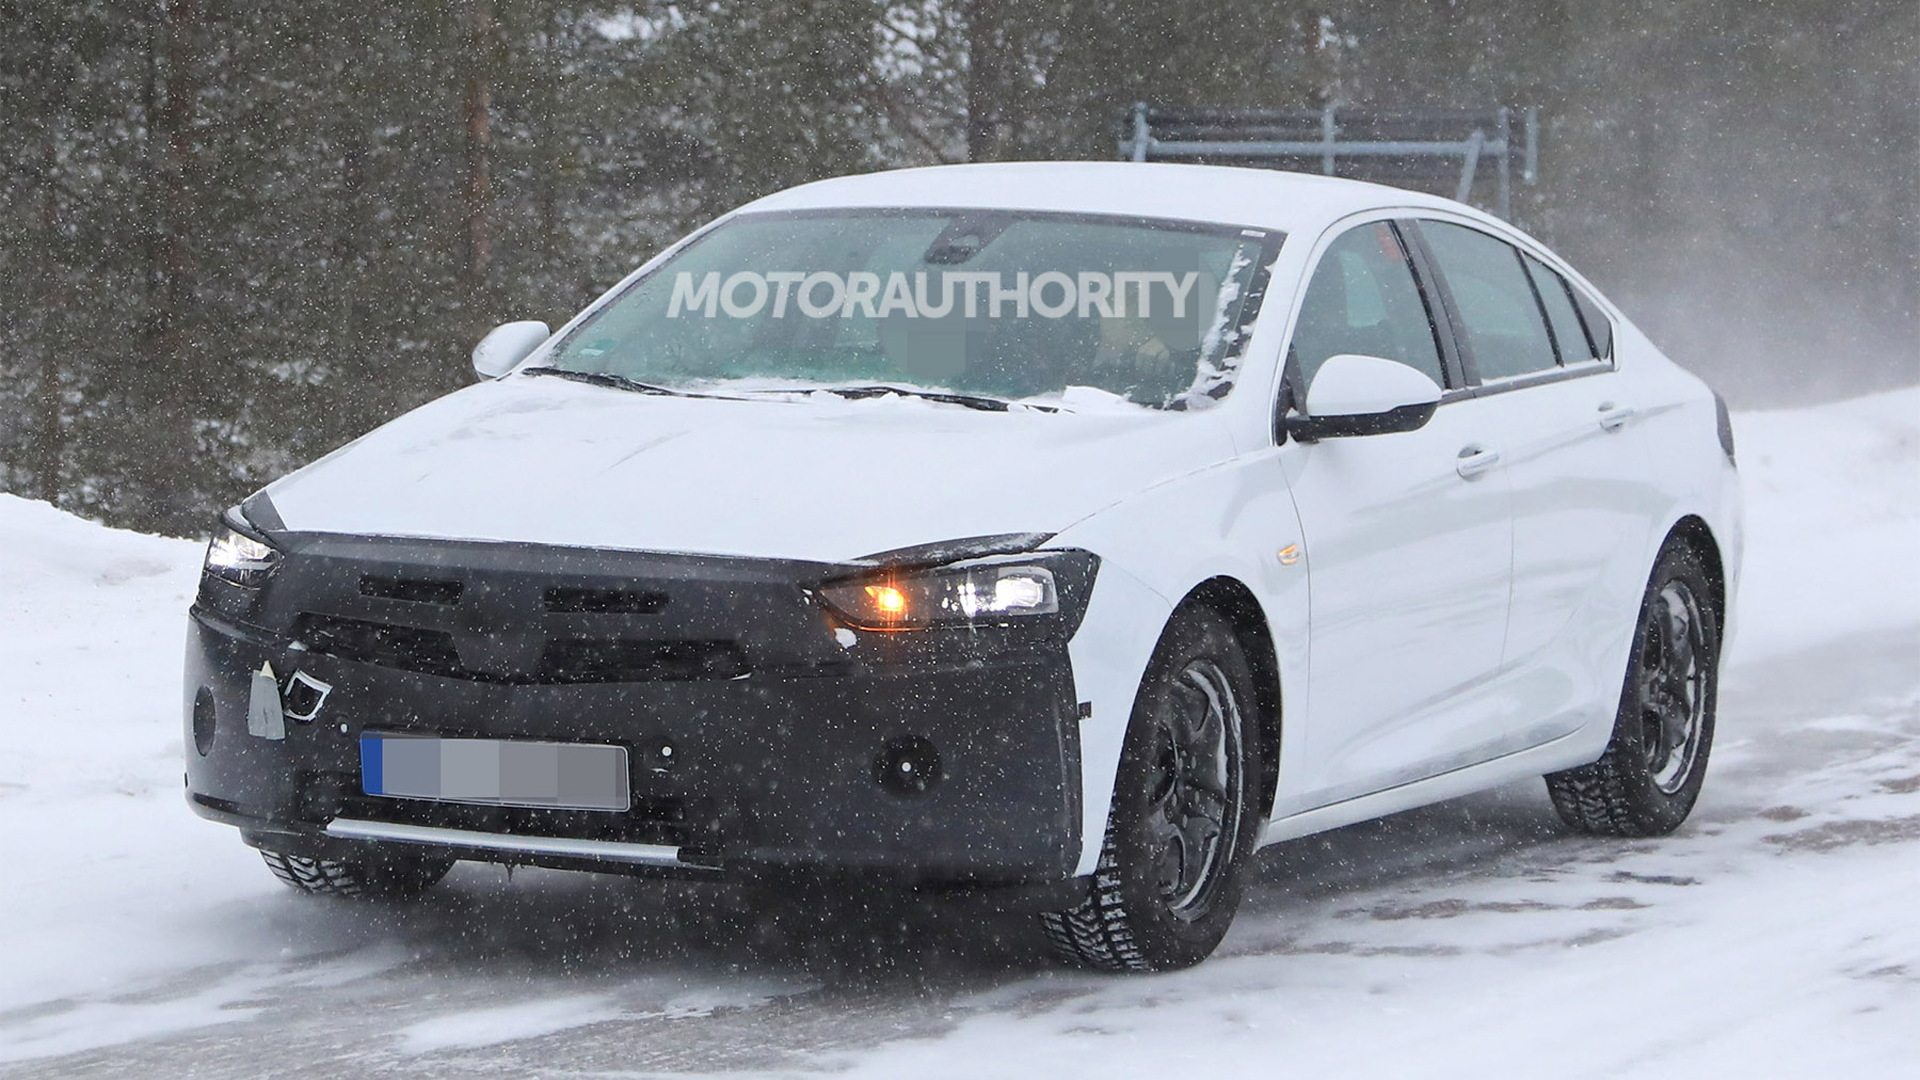 2020 Opel Insignia facelift spy shots - Image via S. Baldauf/SB-Medien